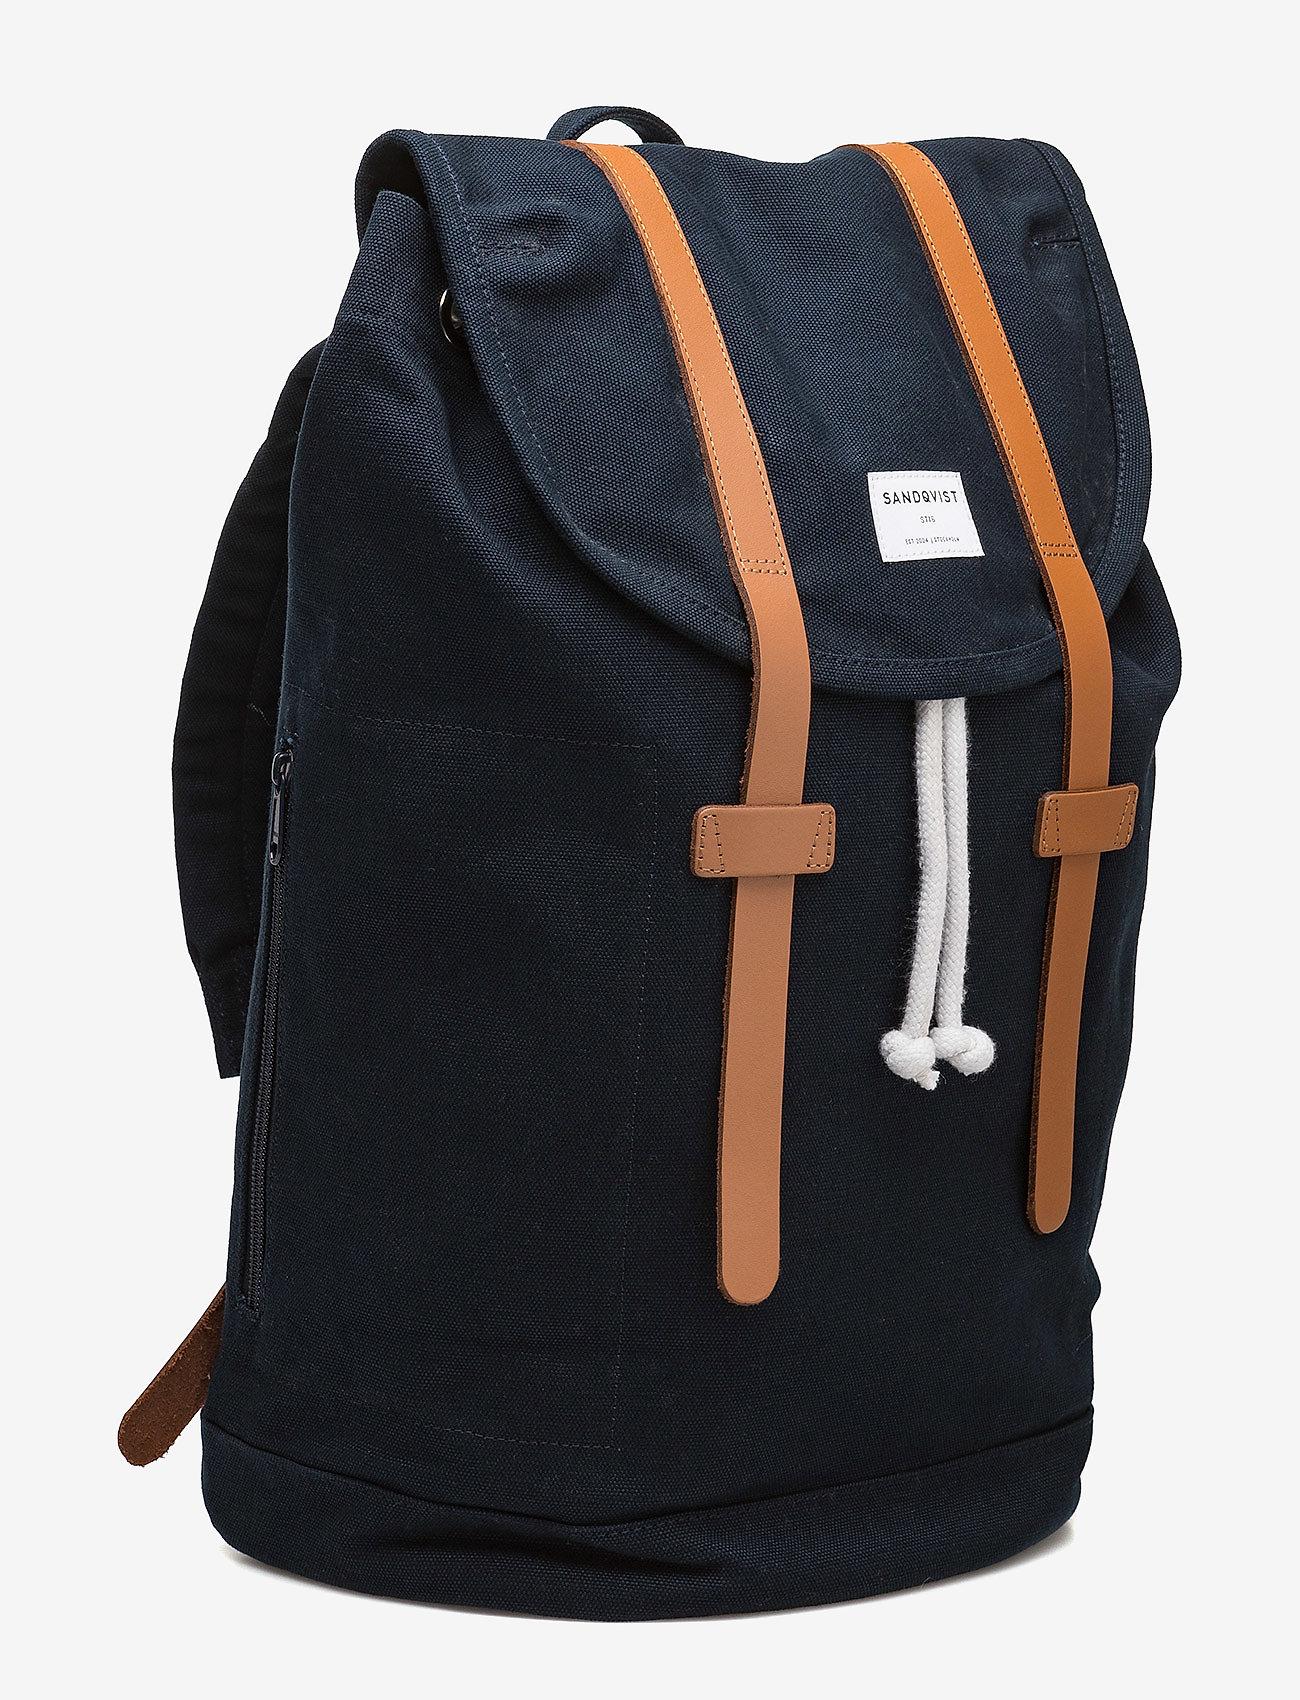 SANDQVIST STIG LARGE - Plecaki BLUE - Torby